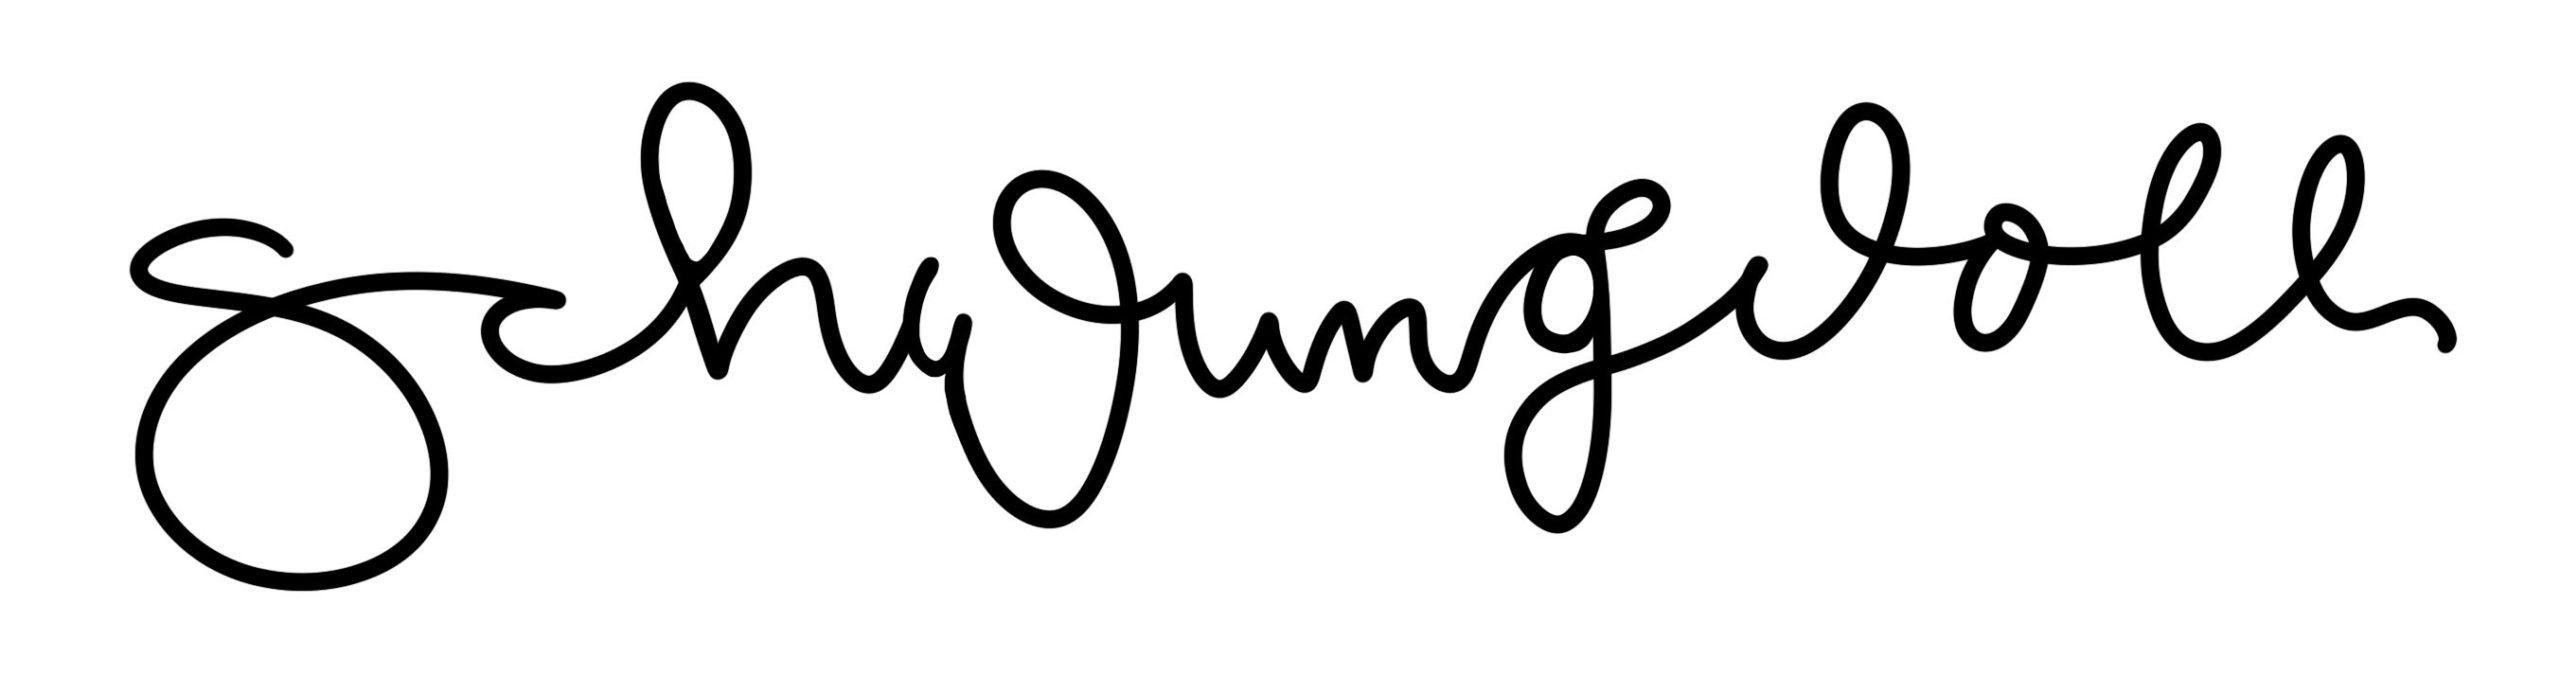 Schwungvolles Lettering als Basic fuer das Brushpen Lettering mit schoen geschwungenen Buchstaben gelettert mit Fineliner bzw. pigment liner